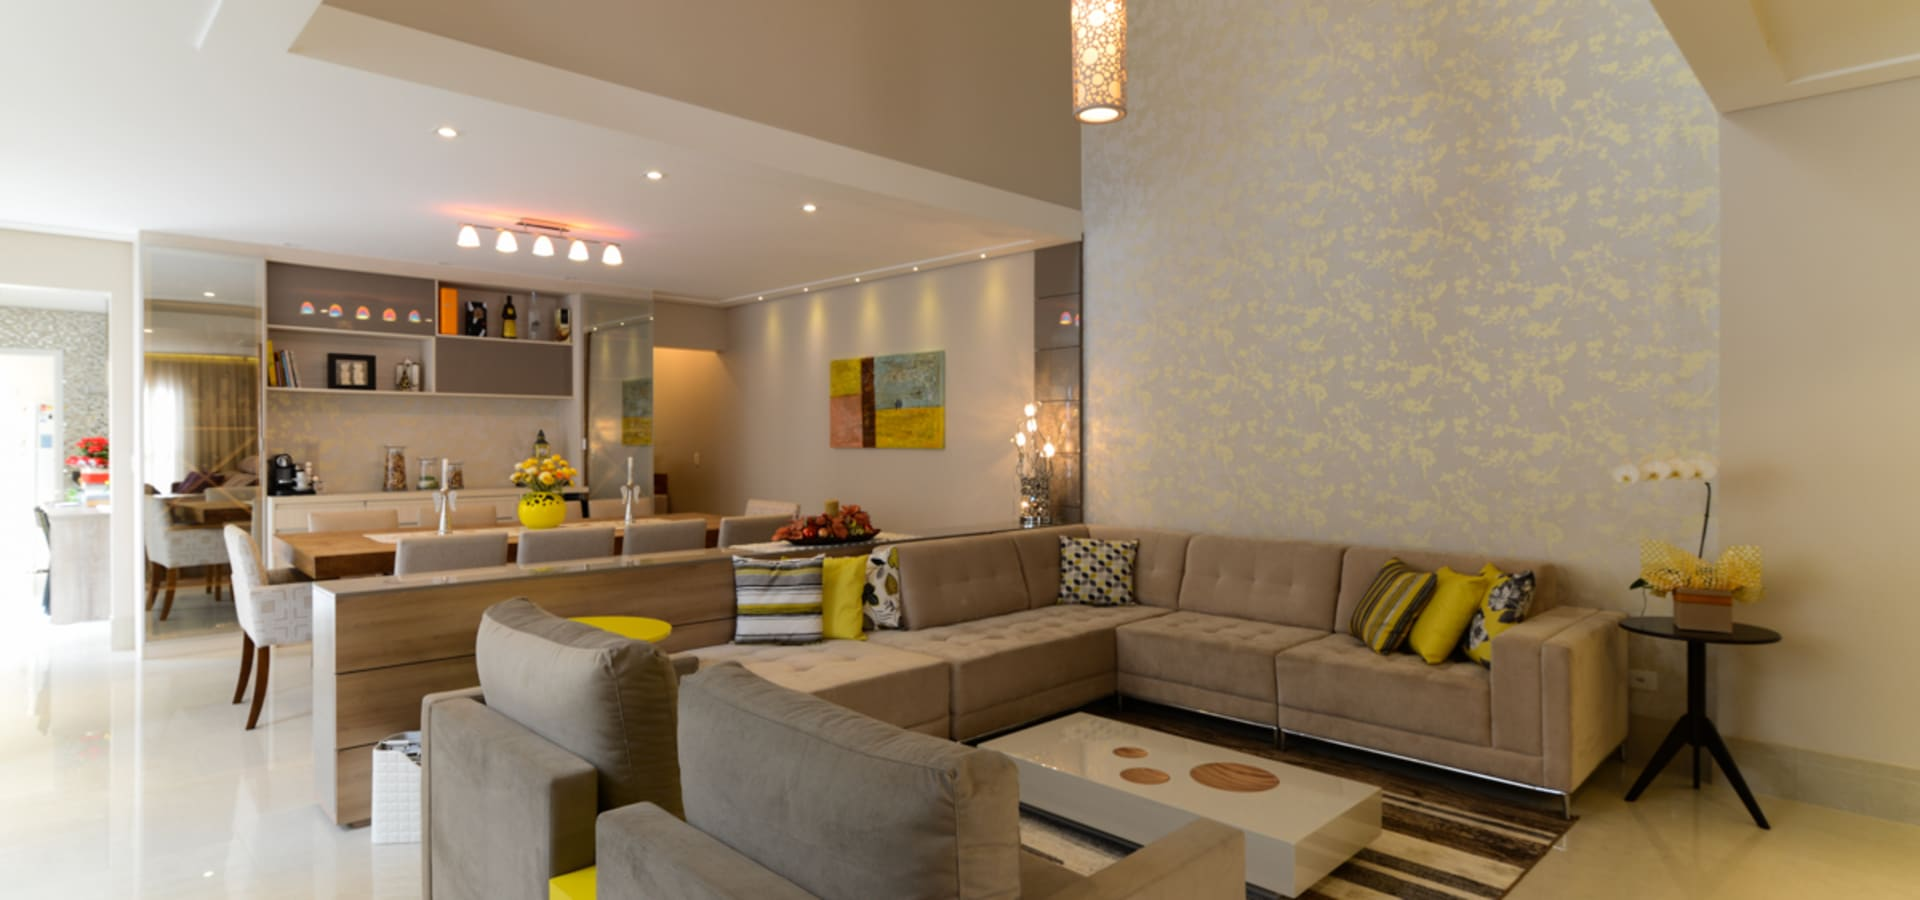 Resid ncia jardim avelino de lam arquitetura interiores - Libros de decoracion de interiores gratis ...